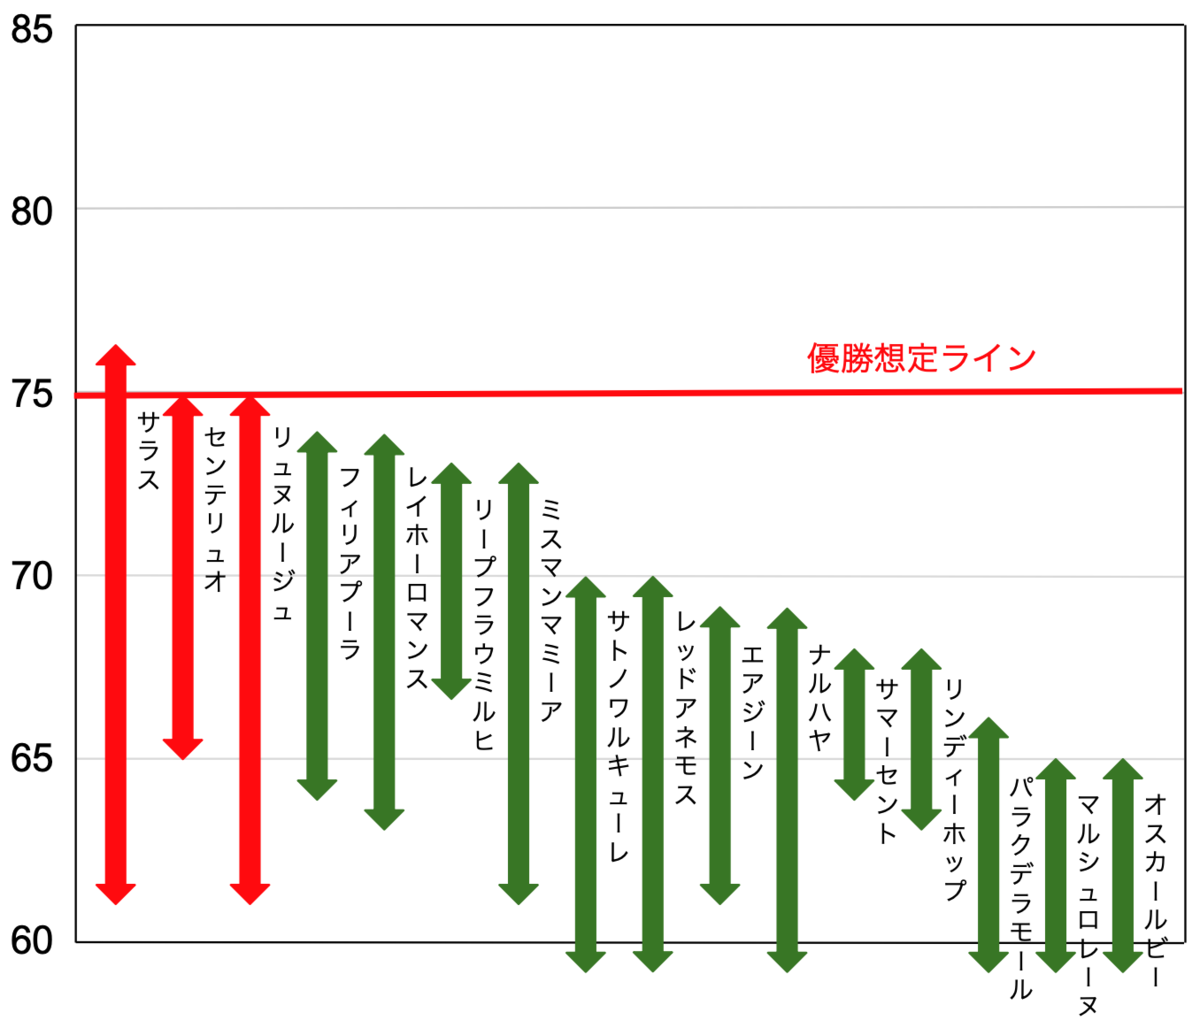 f:id:keibashisuu:20200611215055p:plain